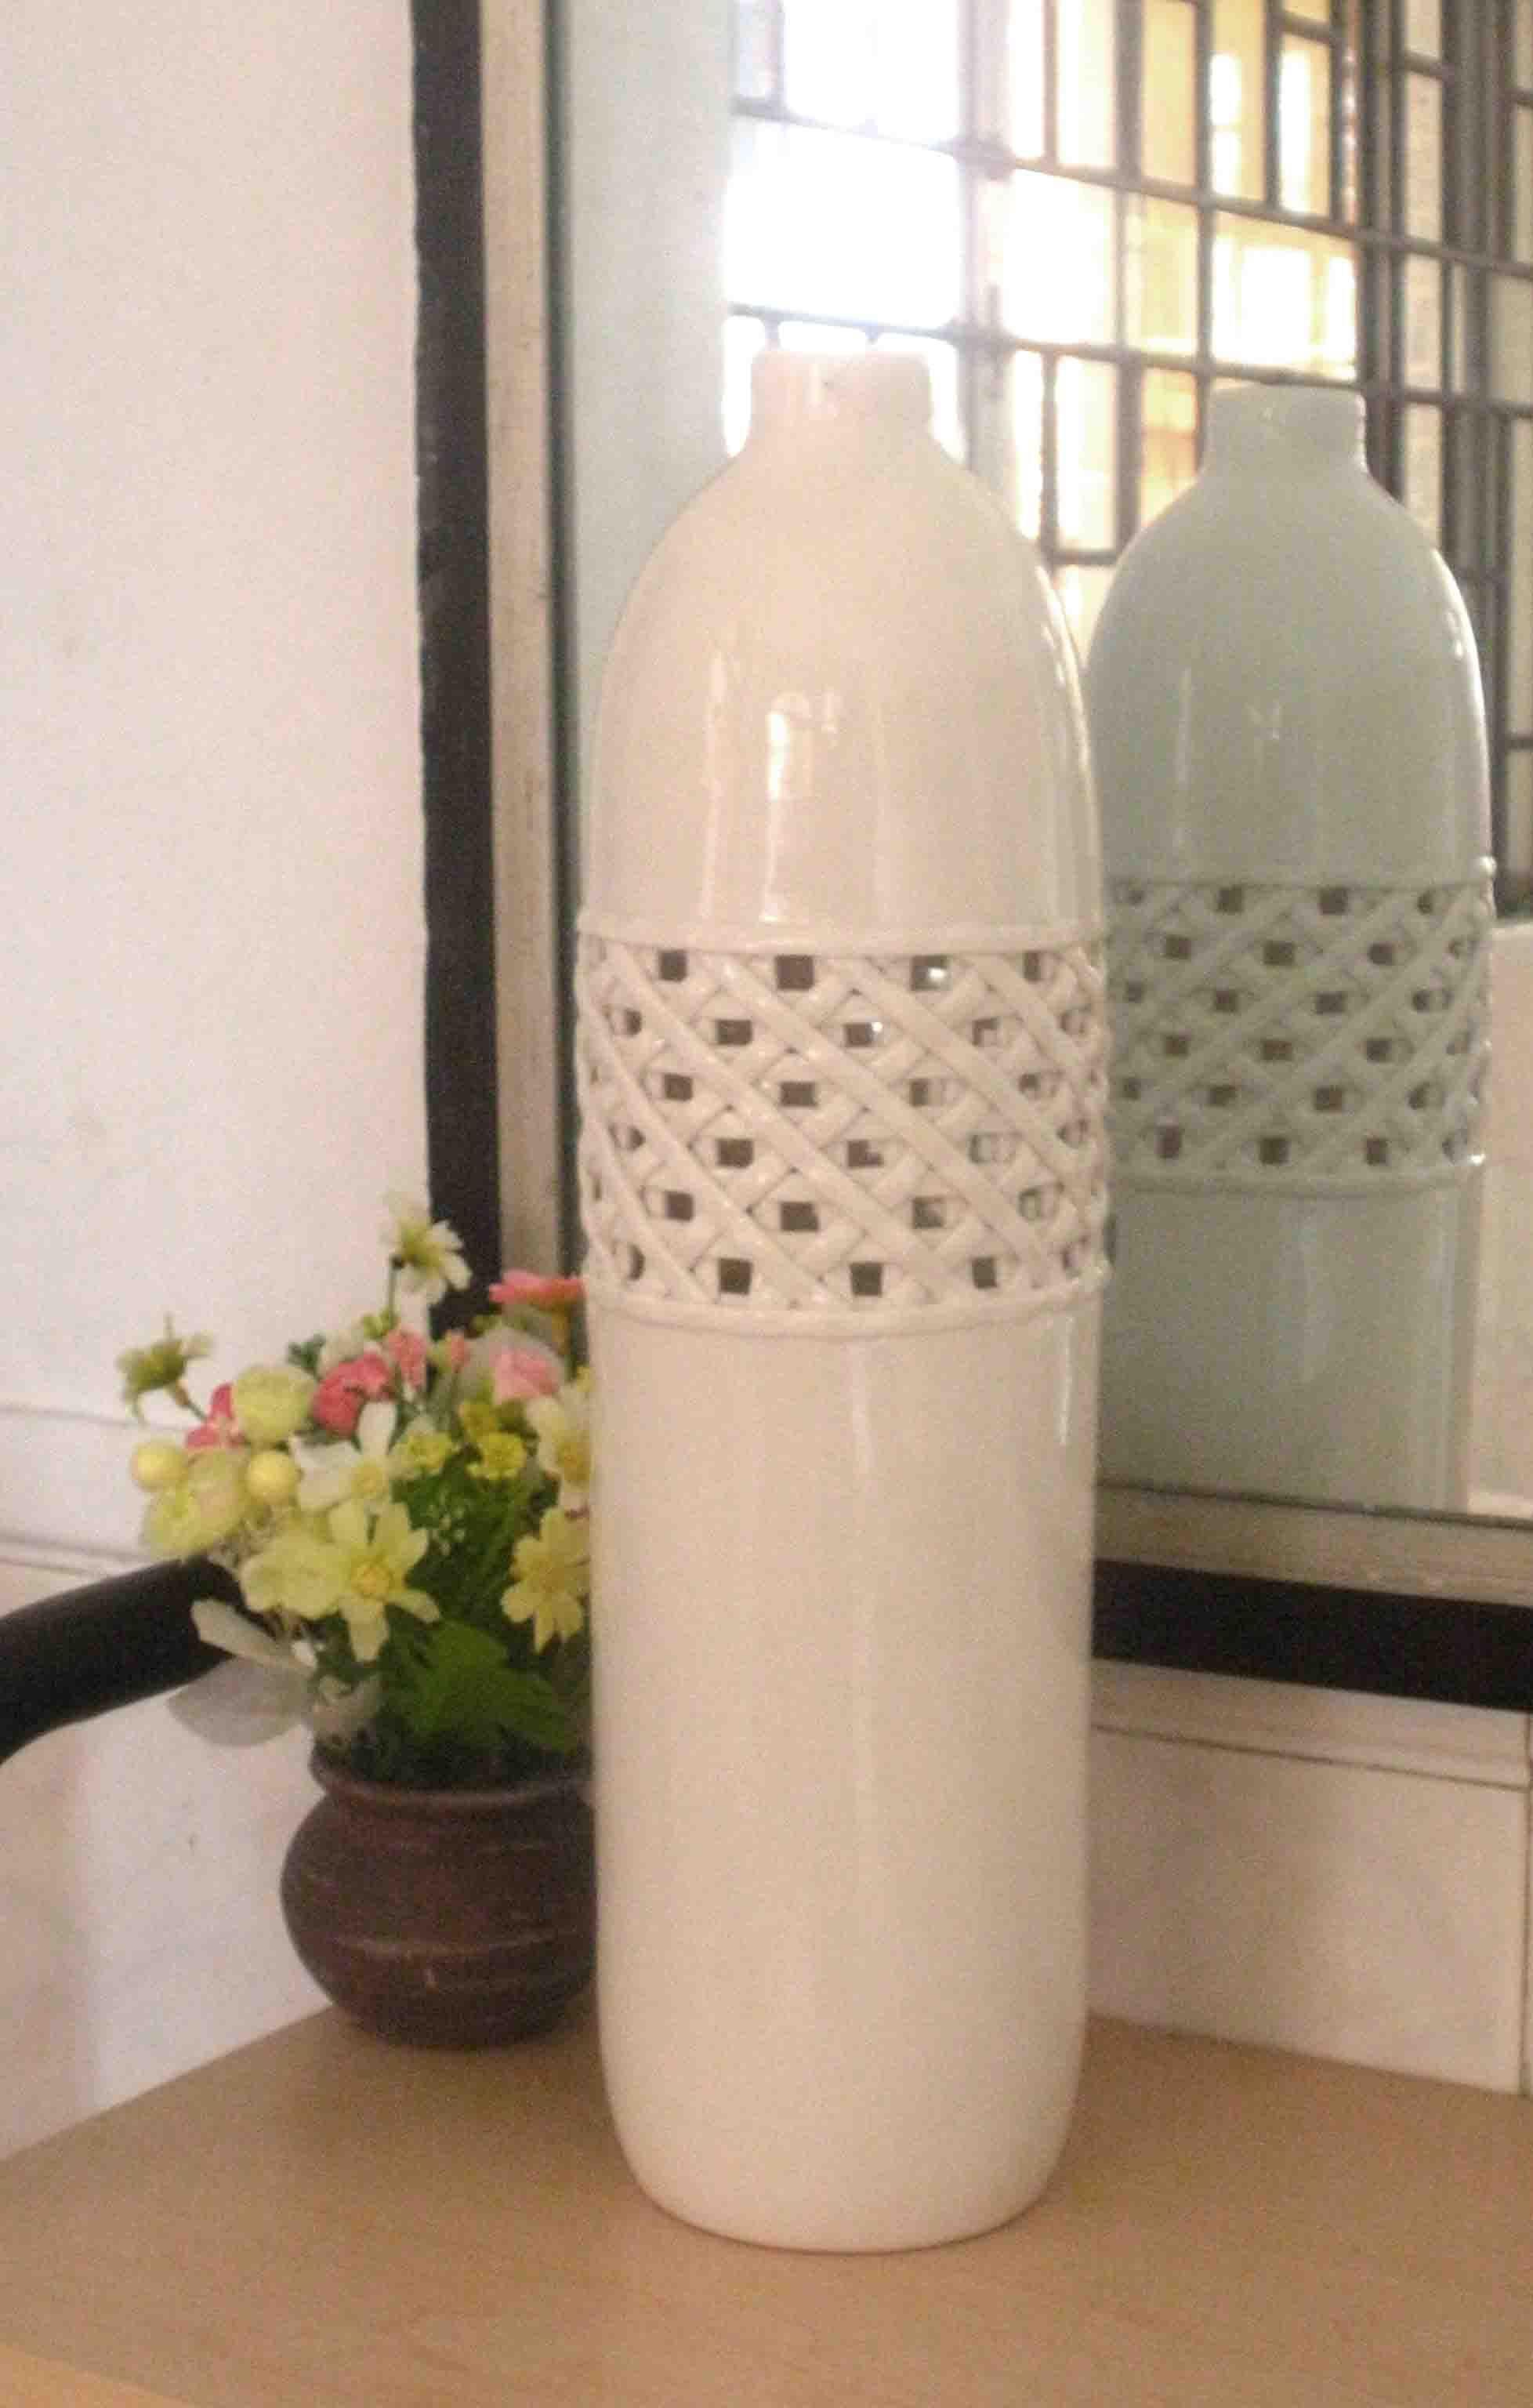 Ceramic decorating vases rumah minimalis wholesale fashion home decoration ceramic vase white pattern reviewsmspy